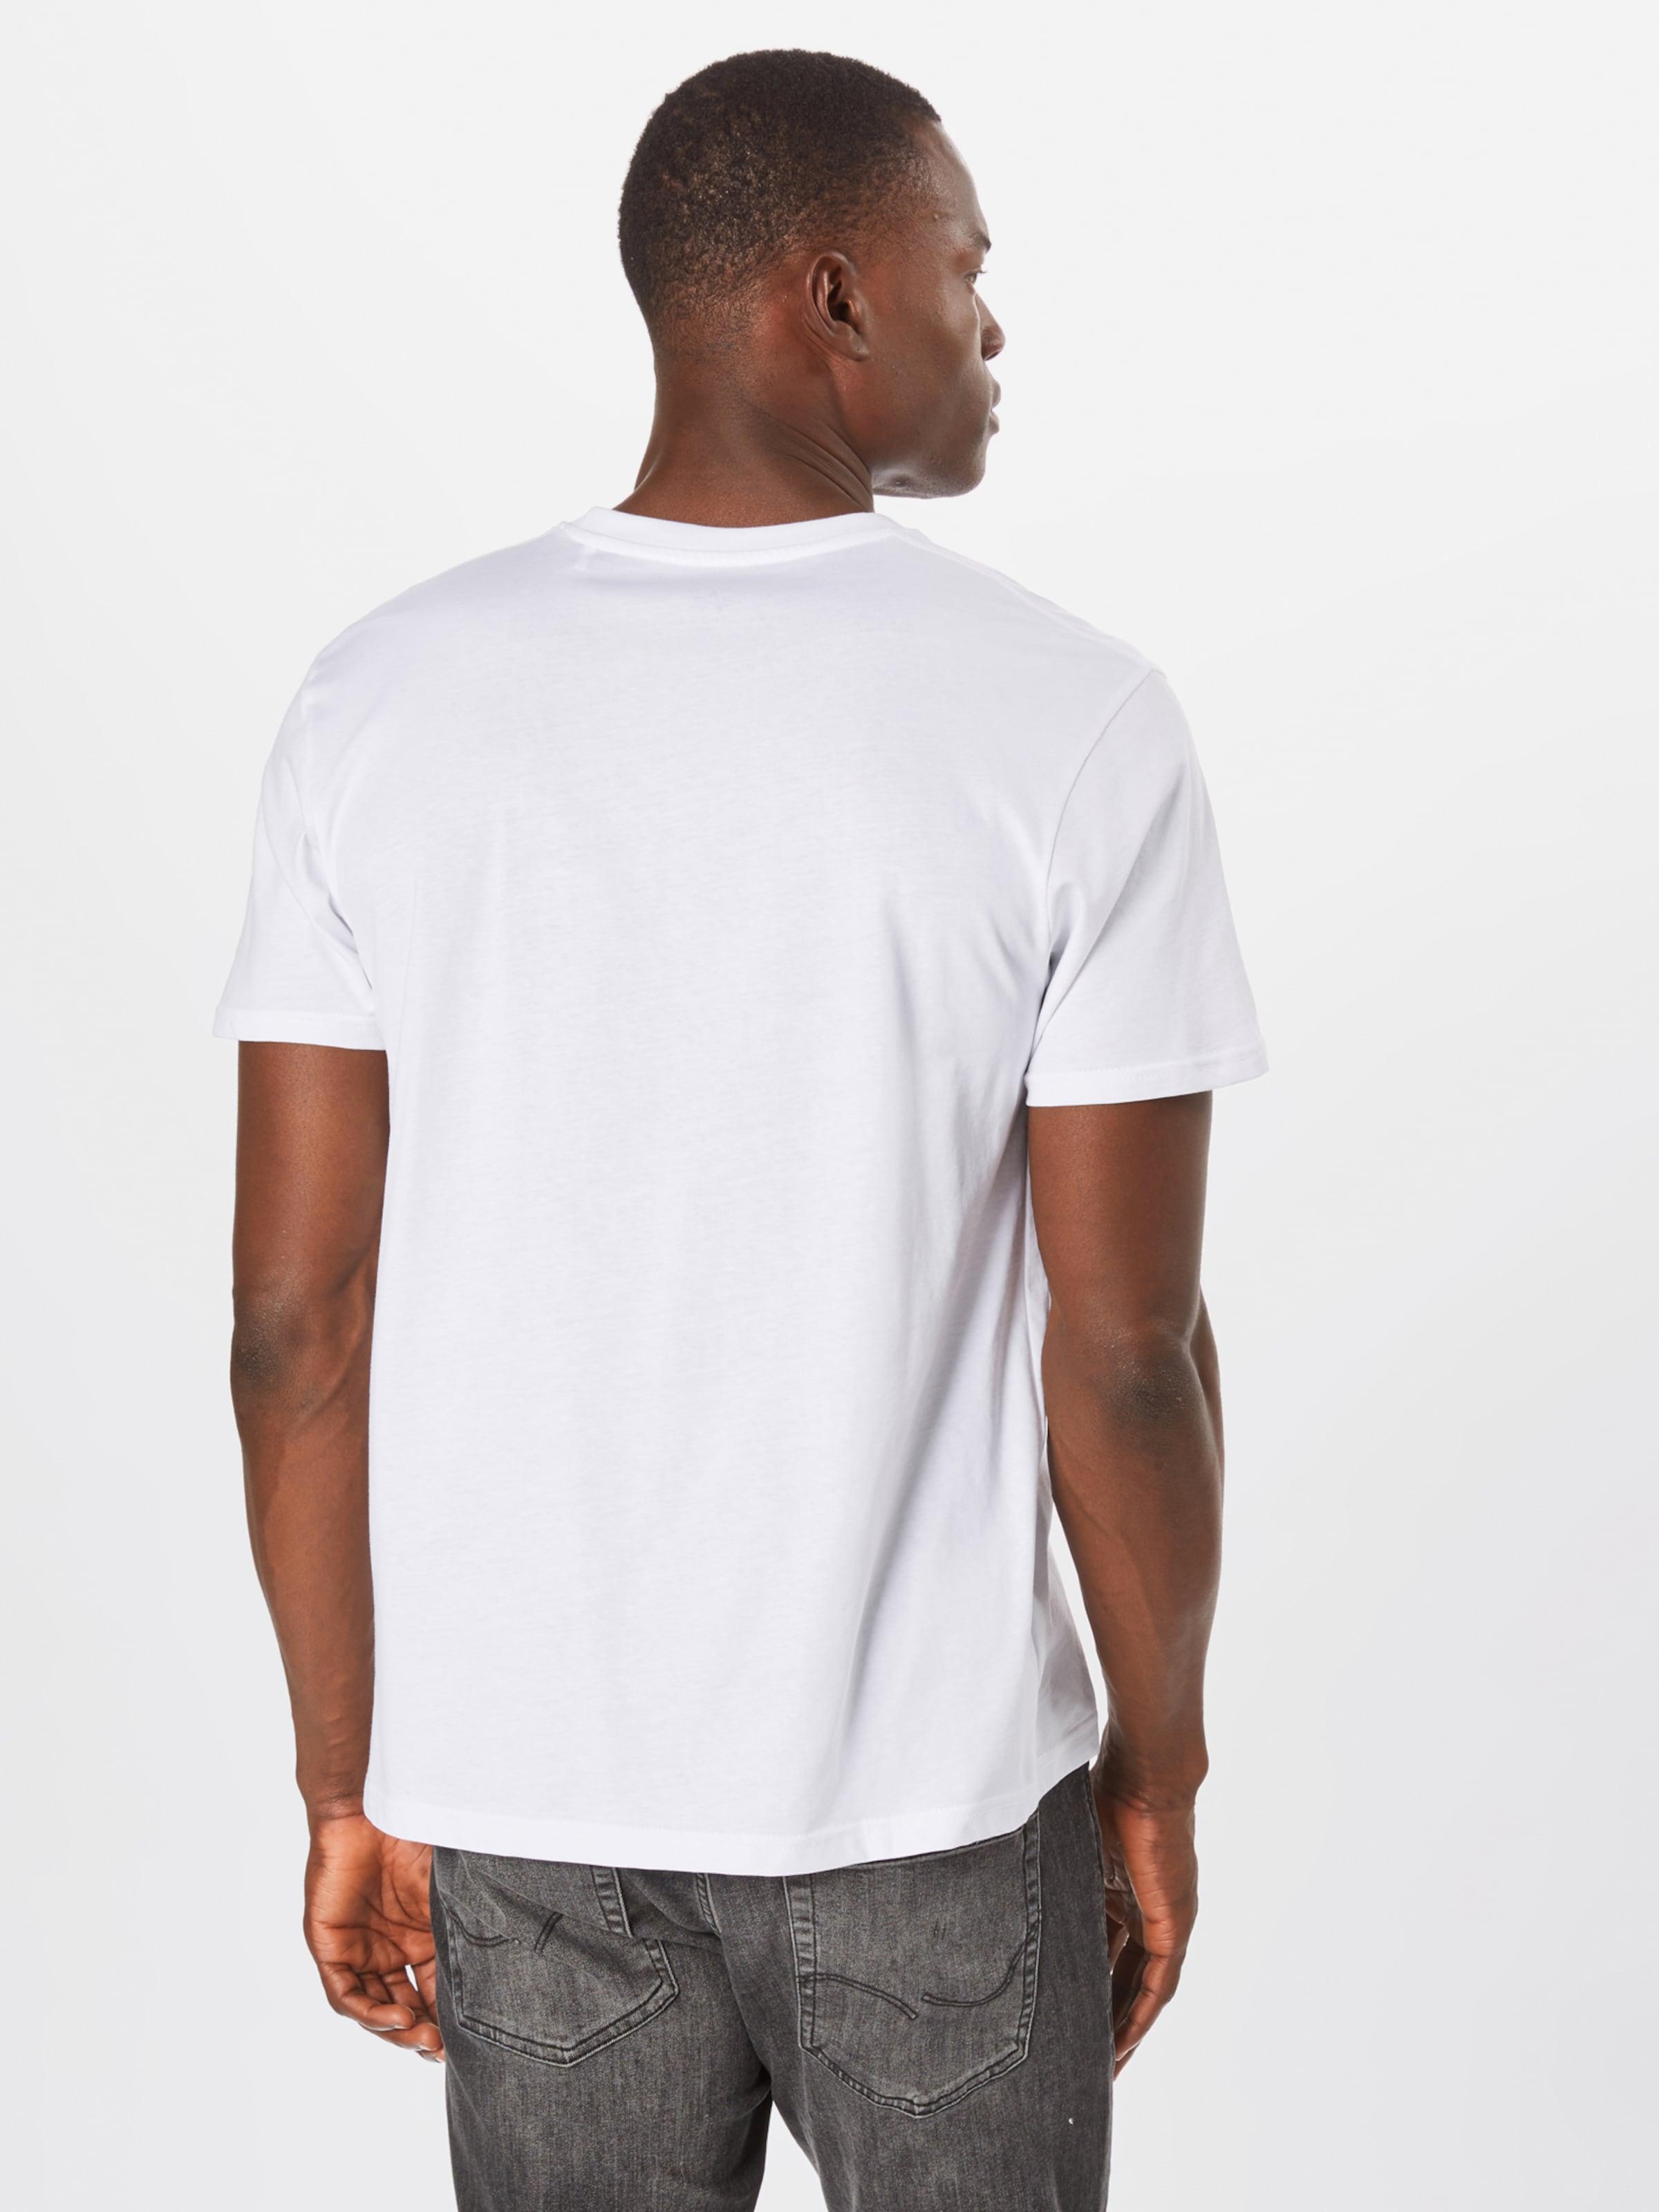 In Alpha Logo' Weiß Shirt 'small Industries rdeCBxo